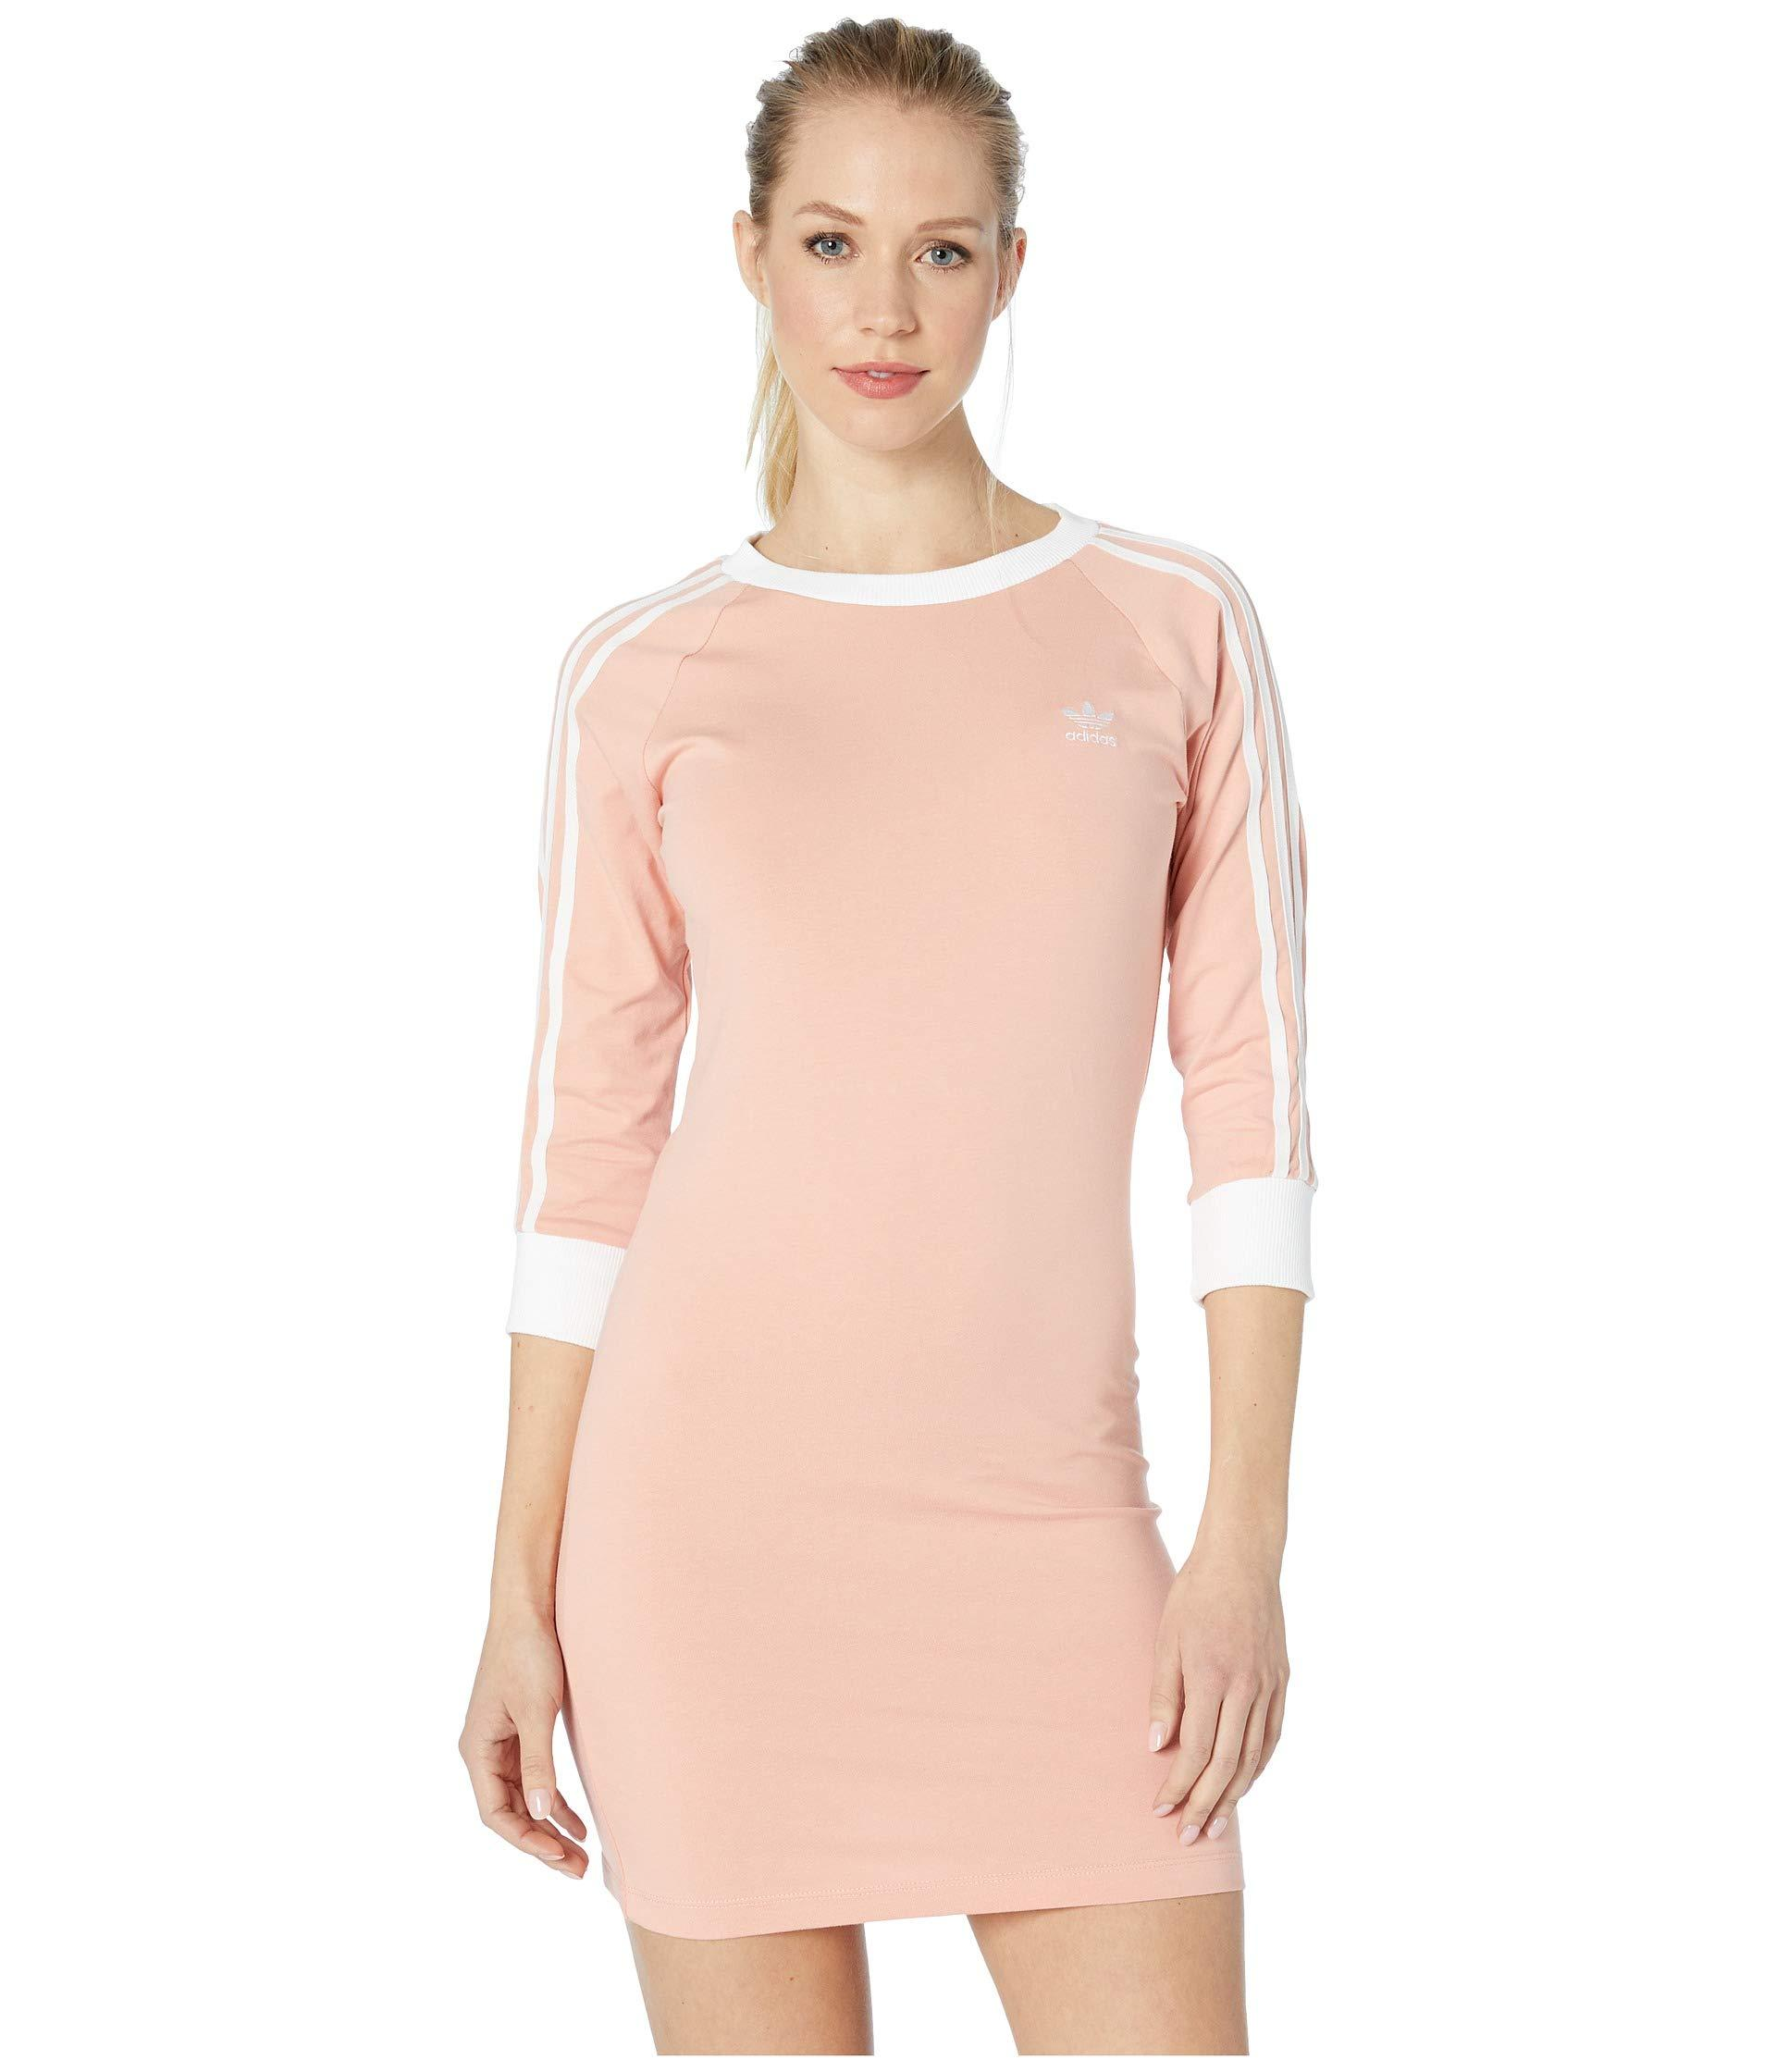 9493177445 Lyst - adidas Originals 3-stripes Dress (dust Pink) Women s Dress in ...